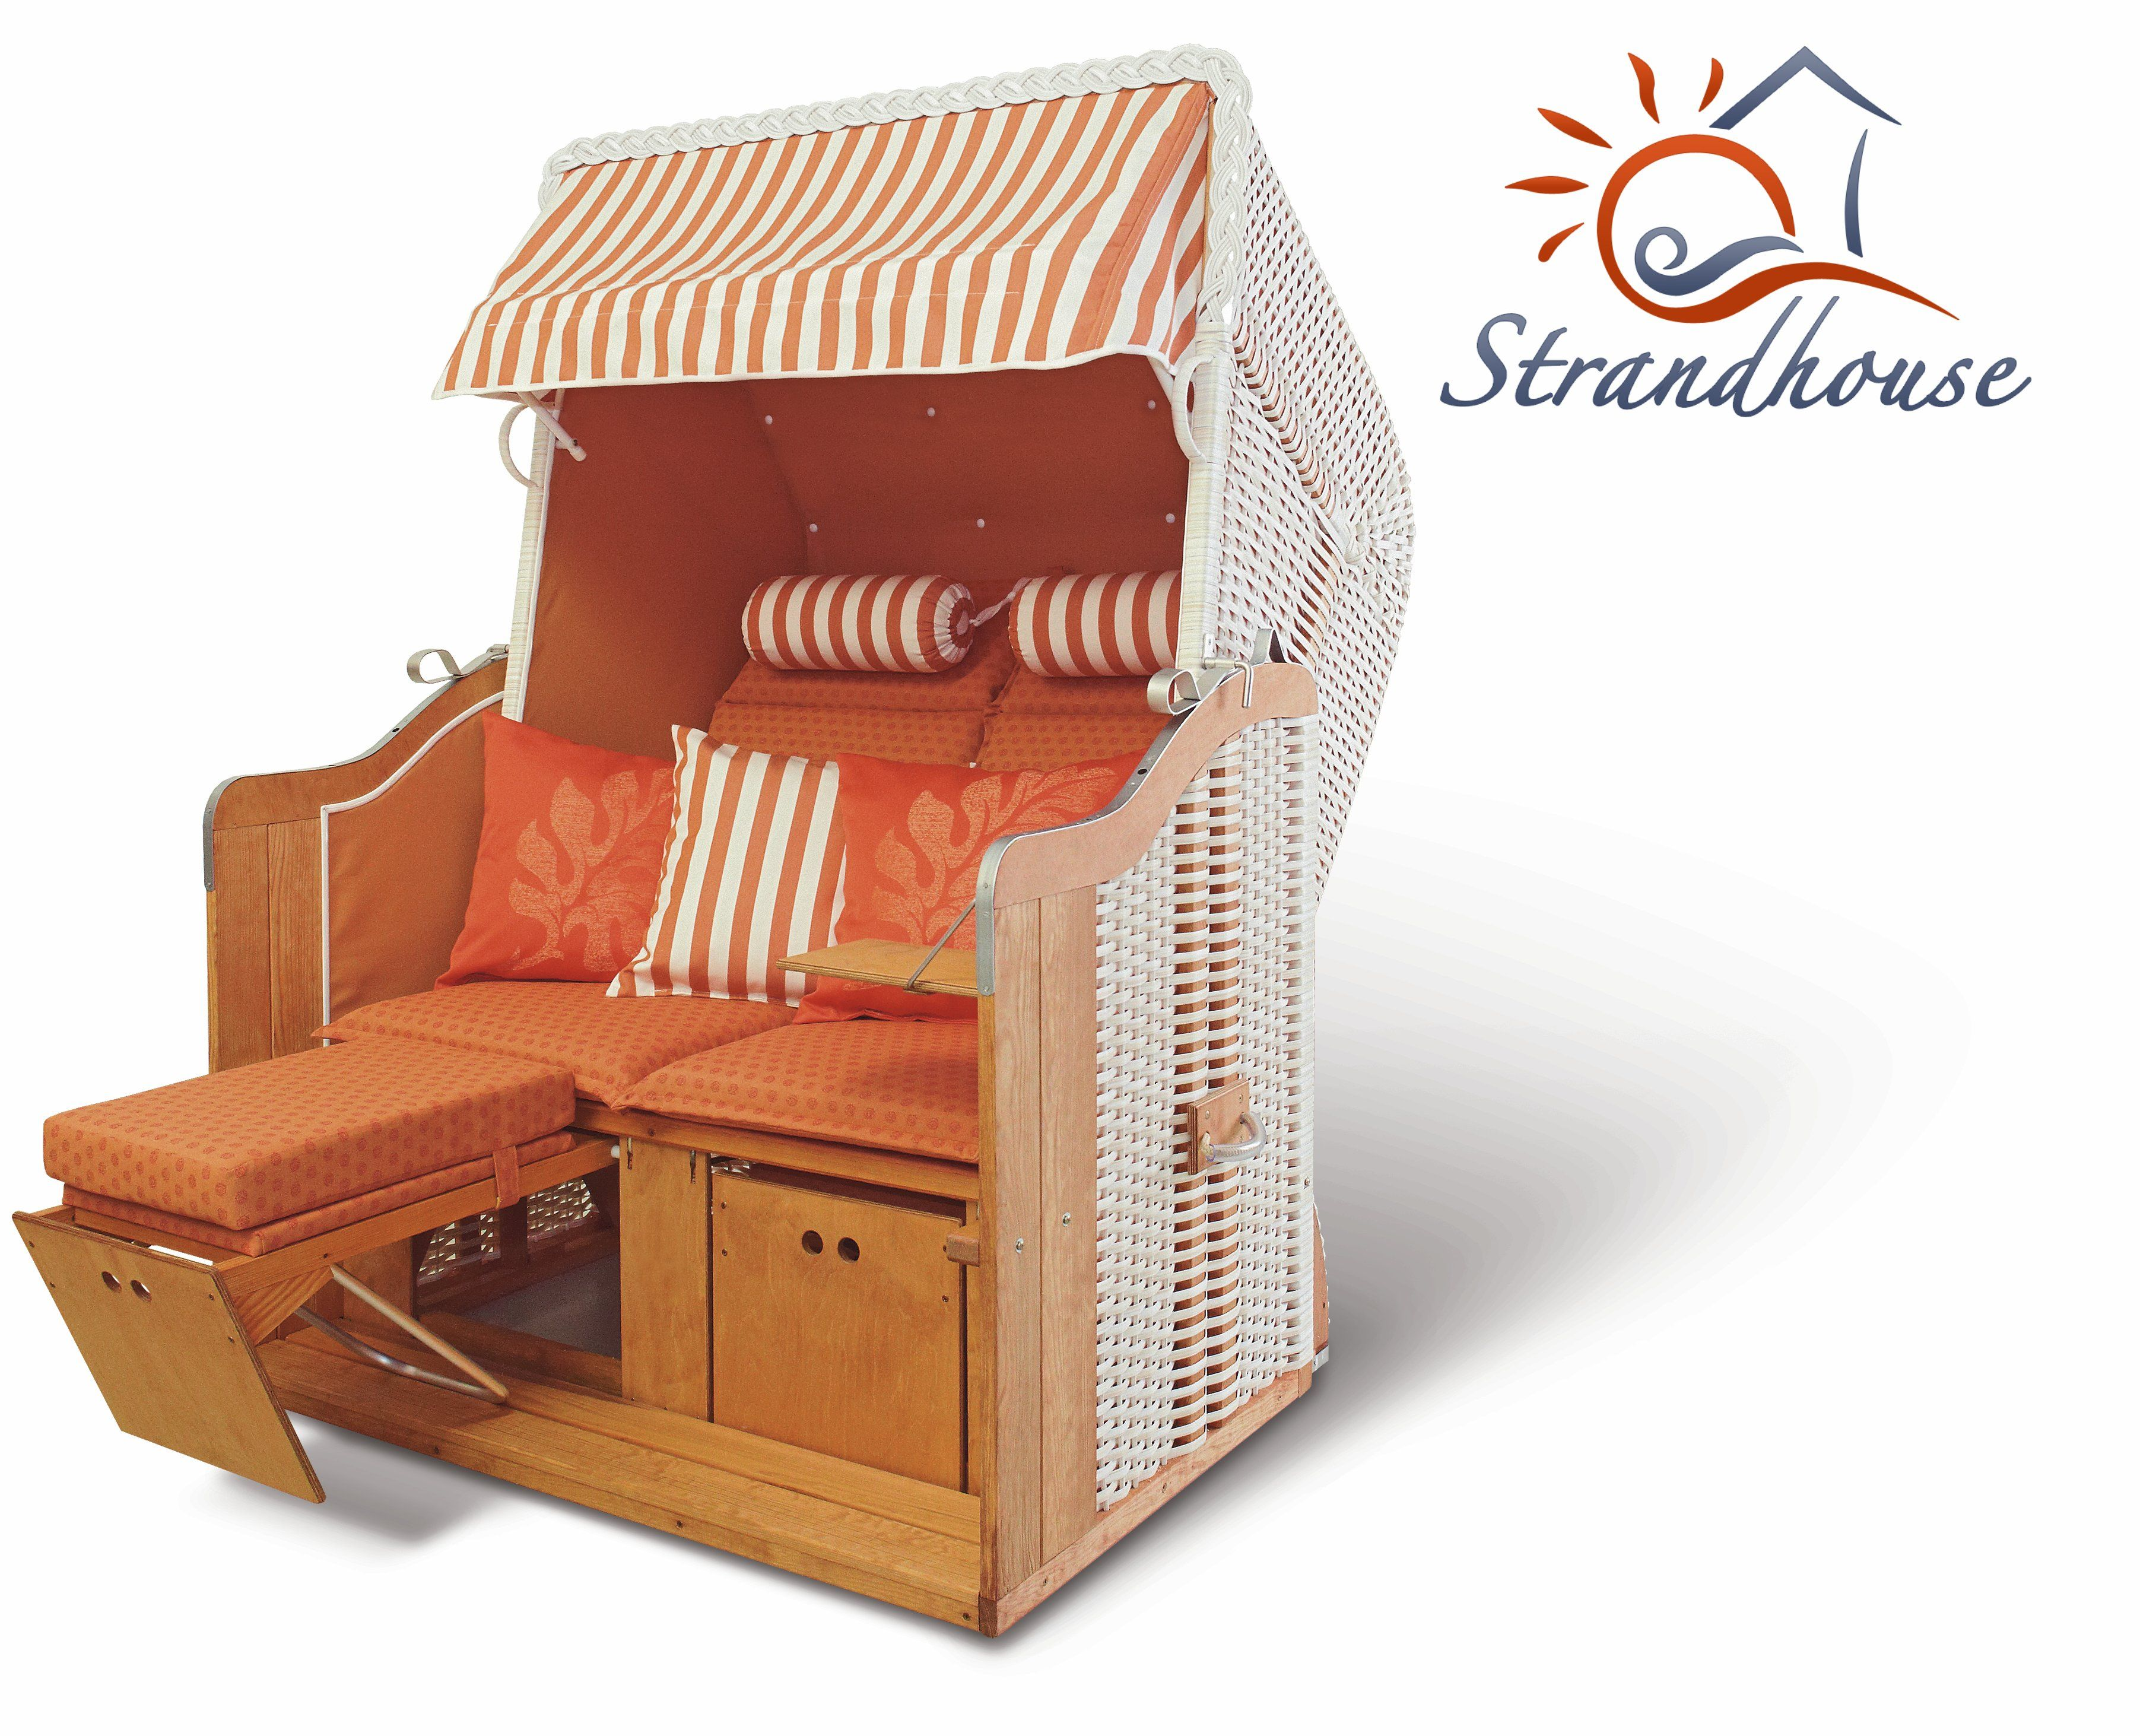 Popular Strandkorb Orange and white